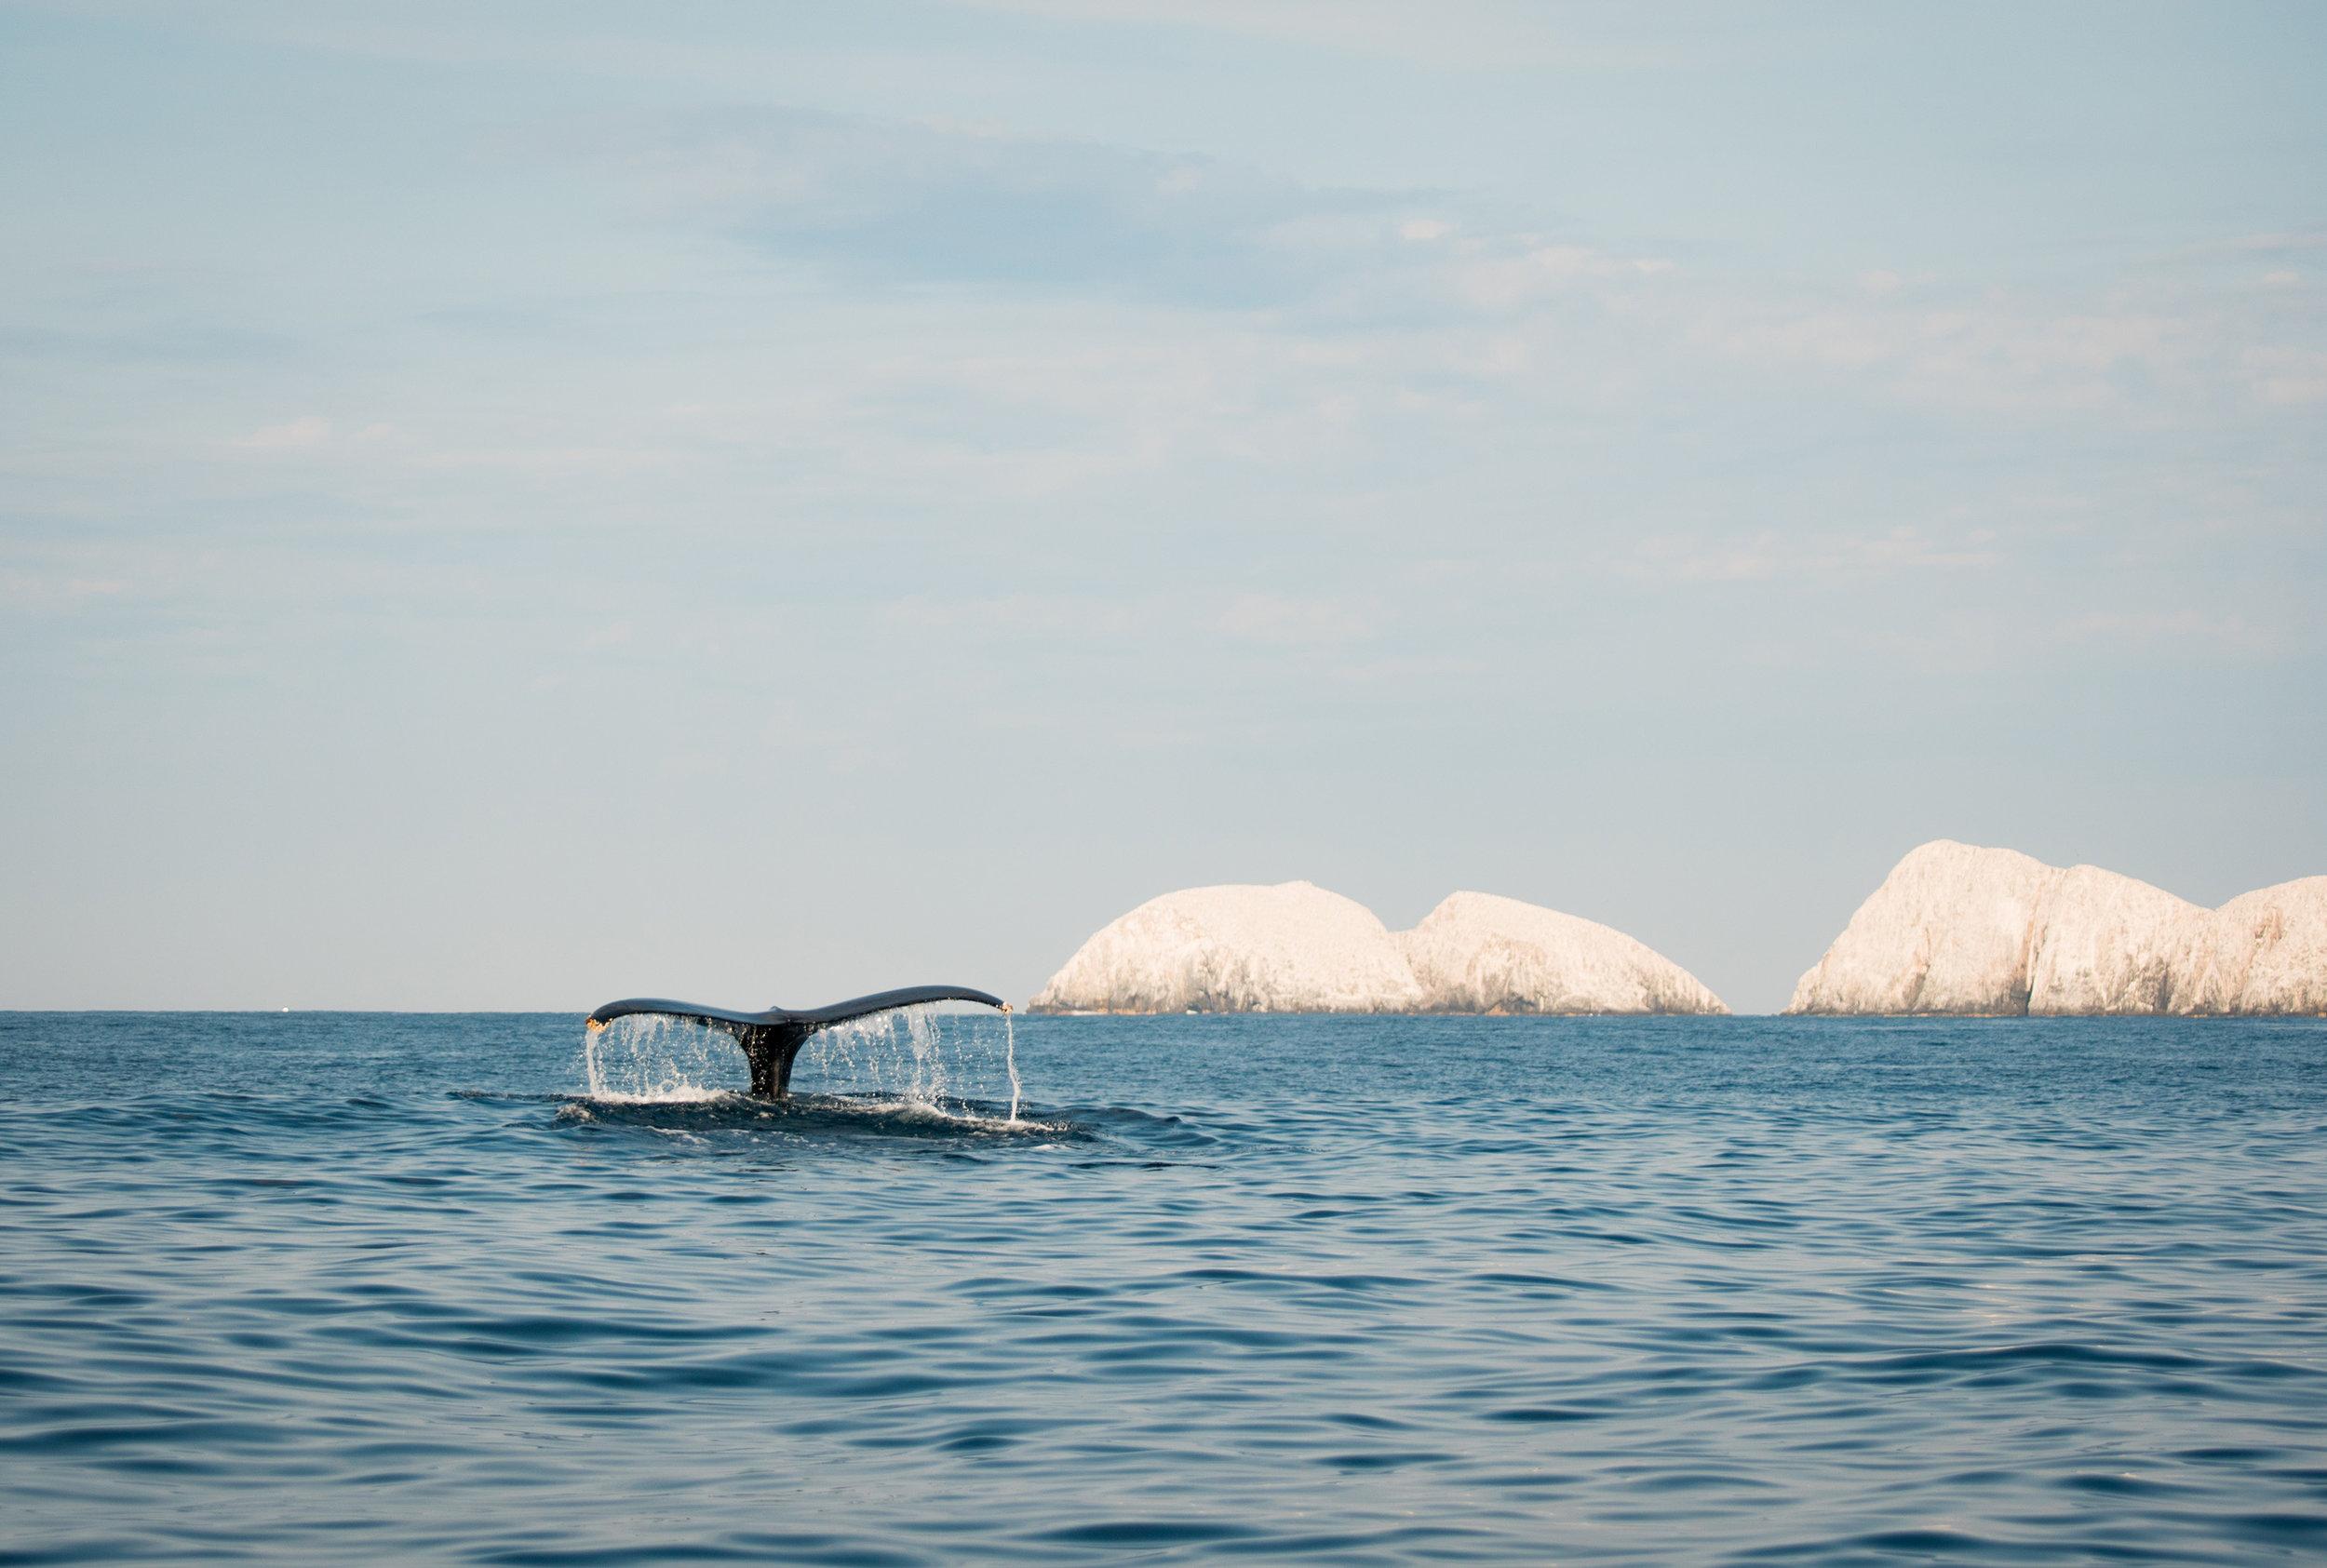 Ballenas-Zihuatanejo-Ixtapa-Fotografia-Heiko-Bothe.jpg